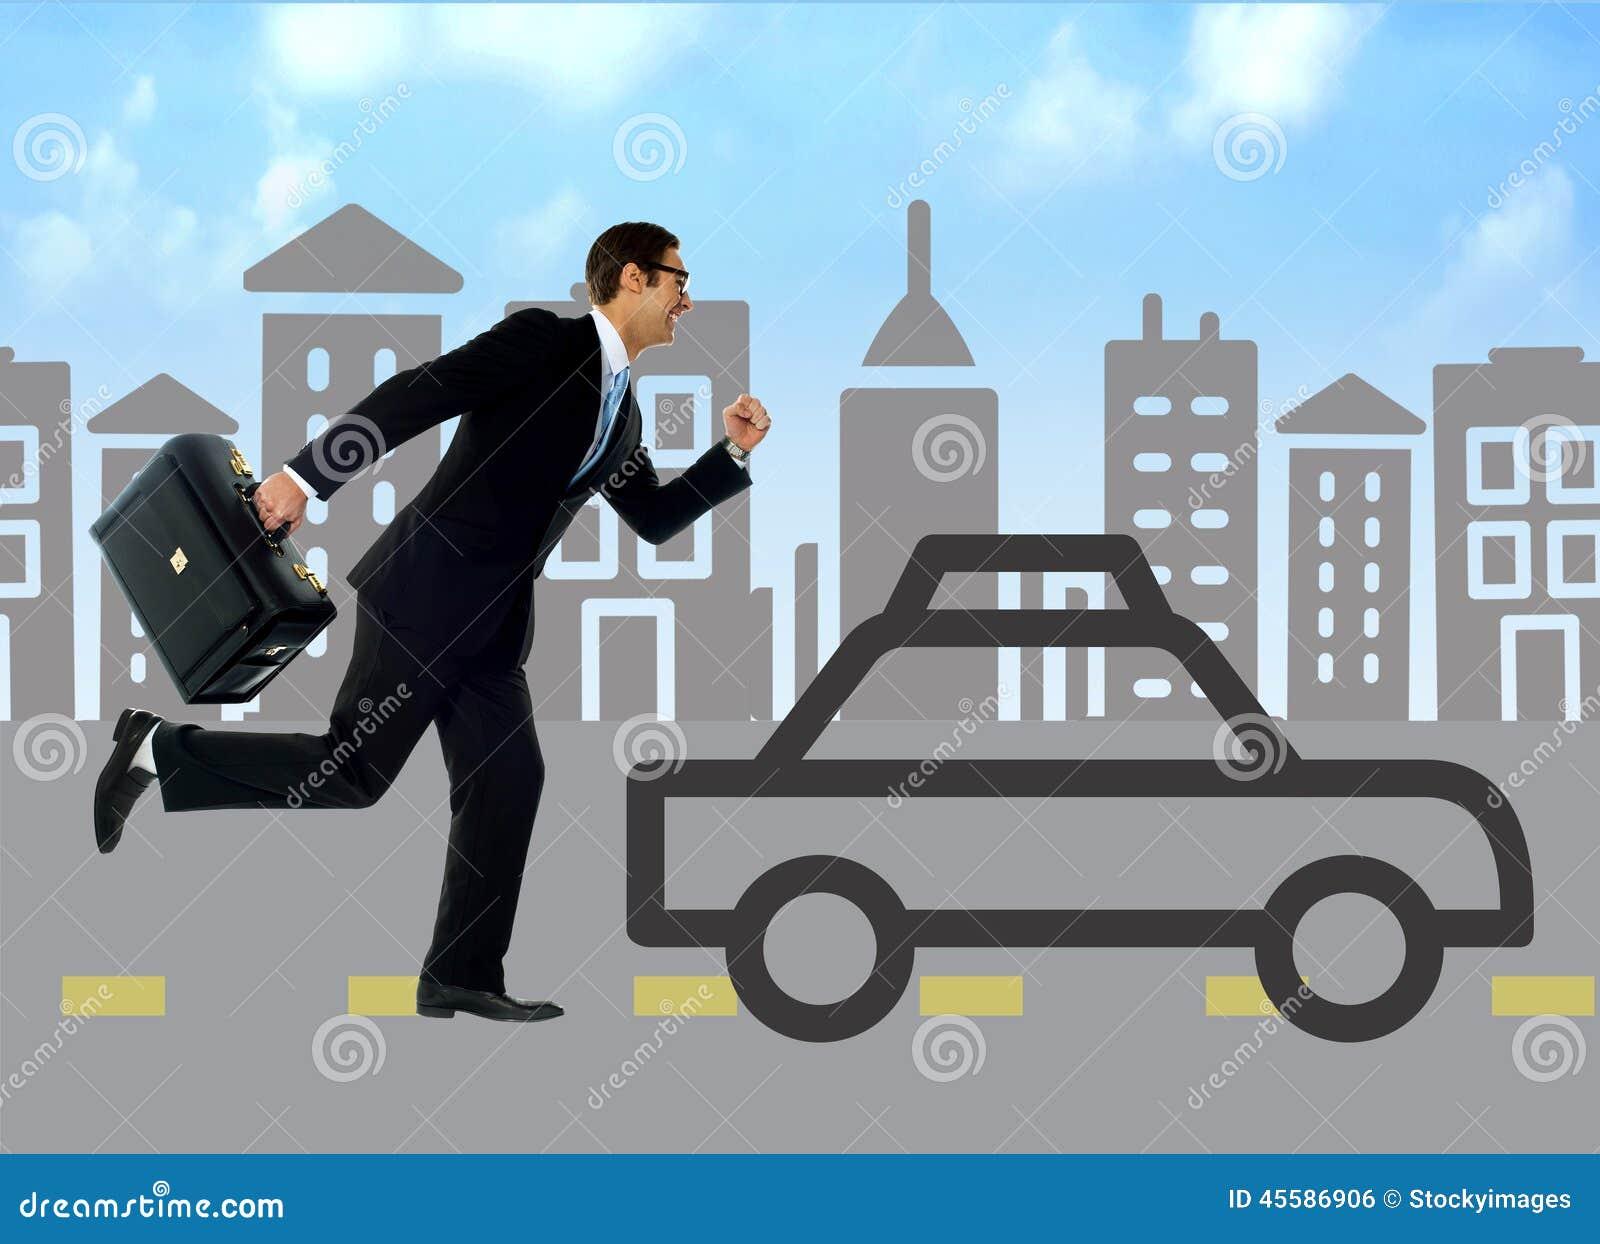 Businessman running behind silhouette car